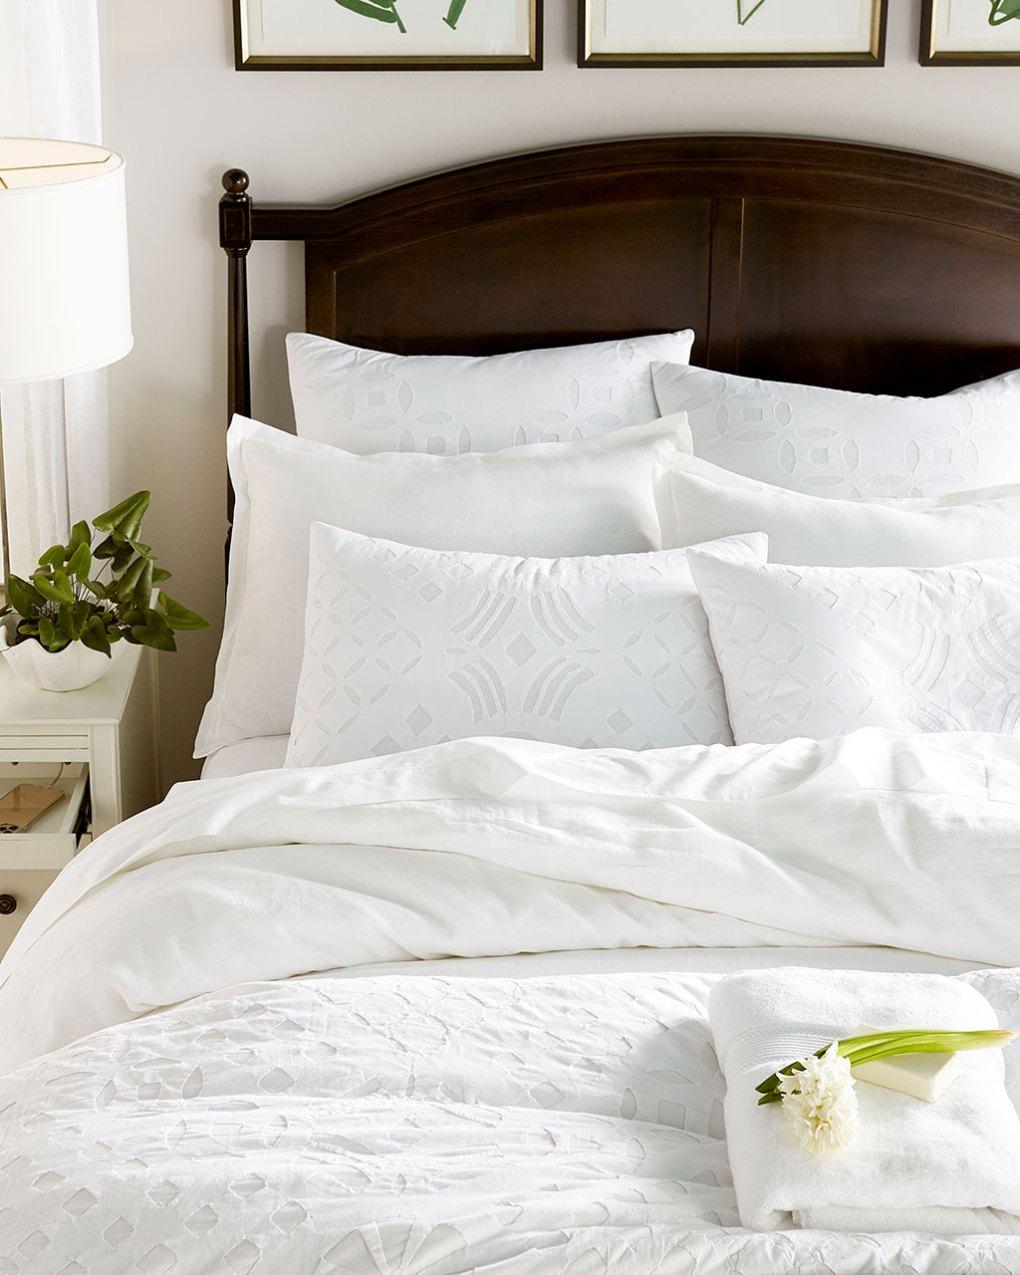 Ballard Designs luxurious white bedding in vacation-inspired bedroom